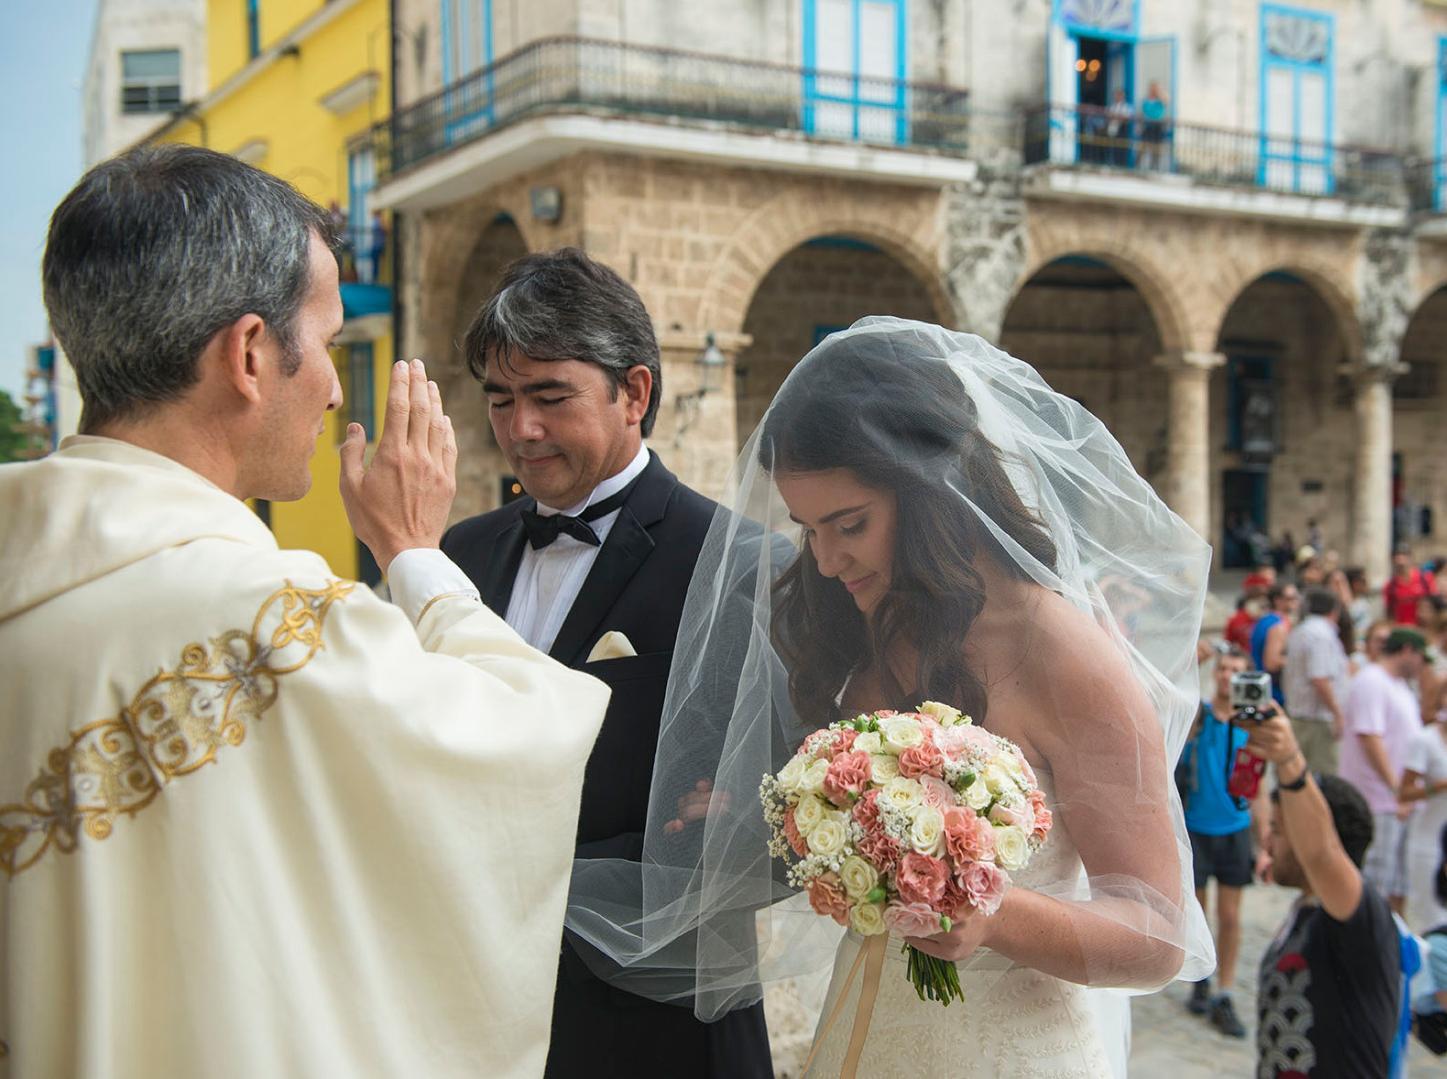 bodas-sin-clasificar-sin-tema-cuba-14851.jpg